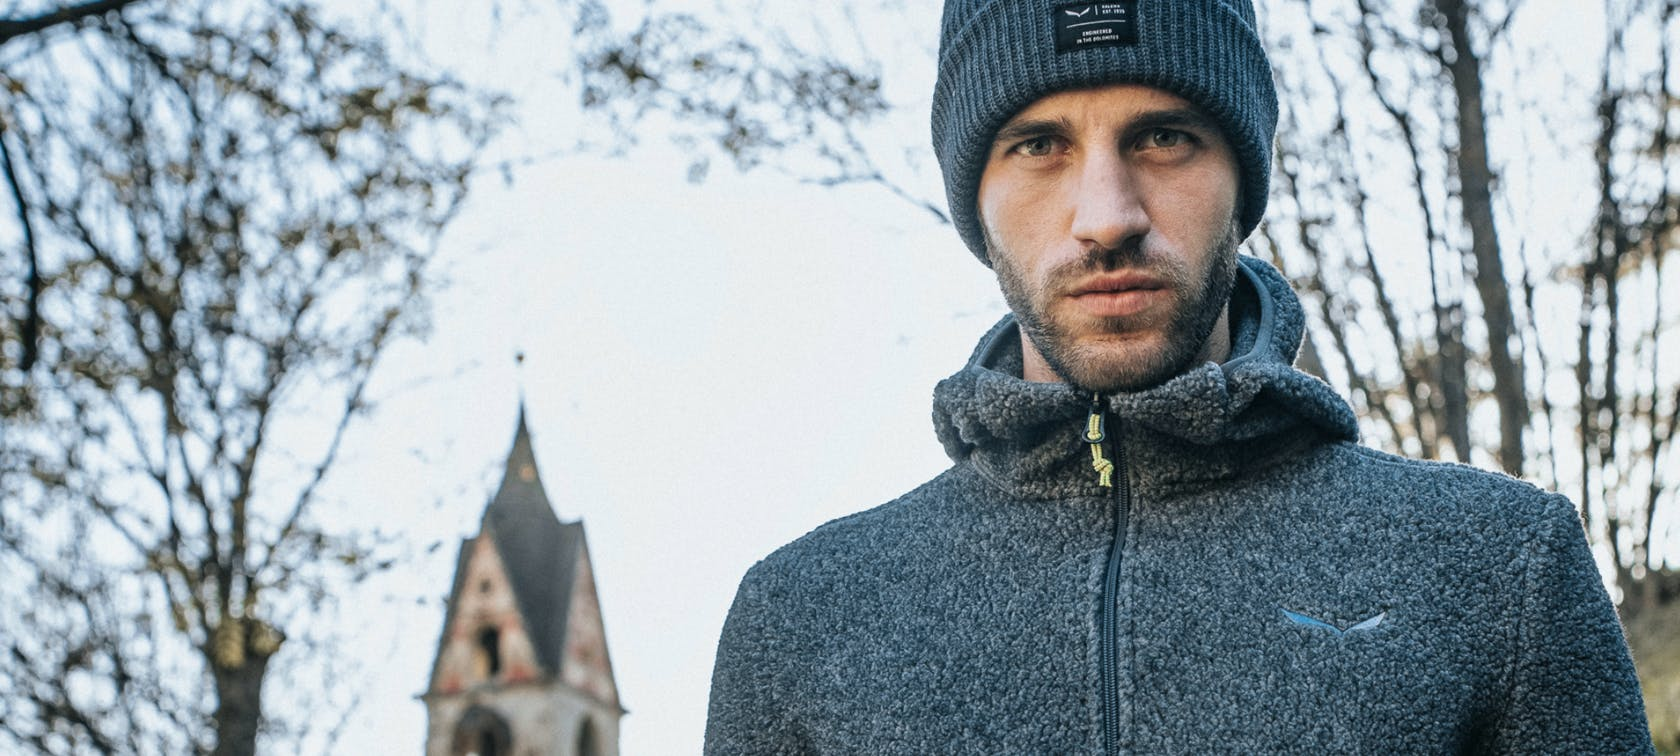 Salewa Alpine Style uomo